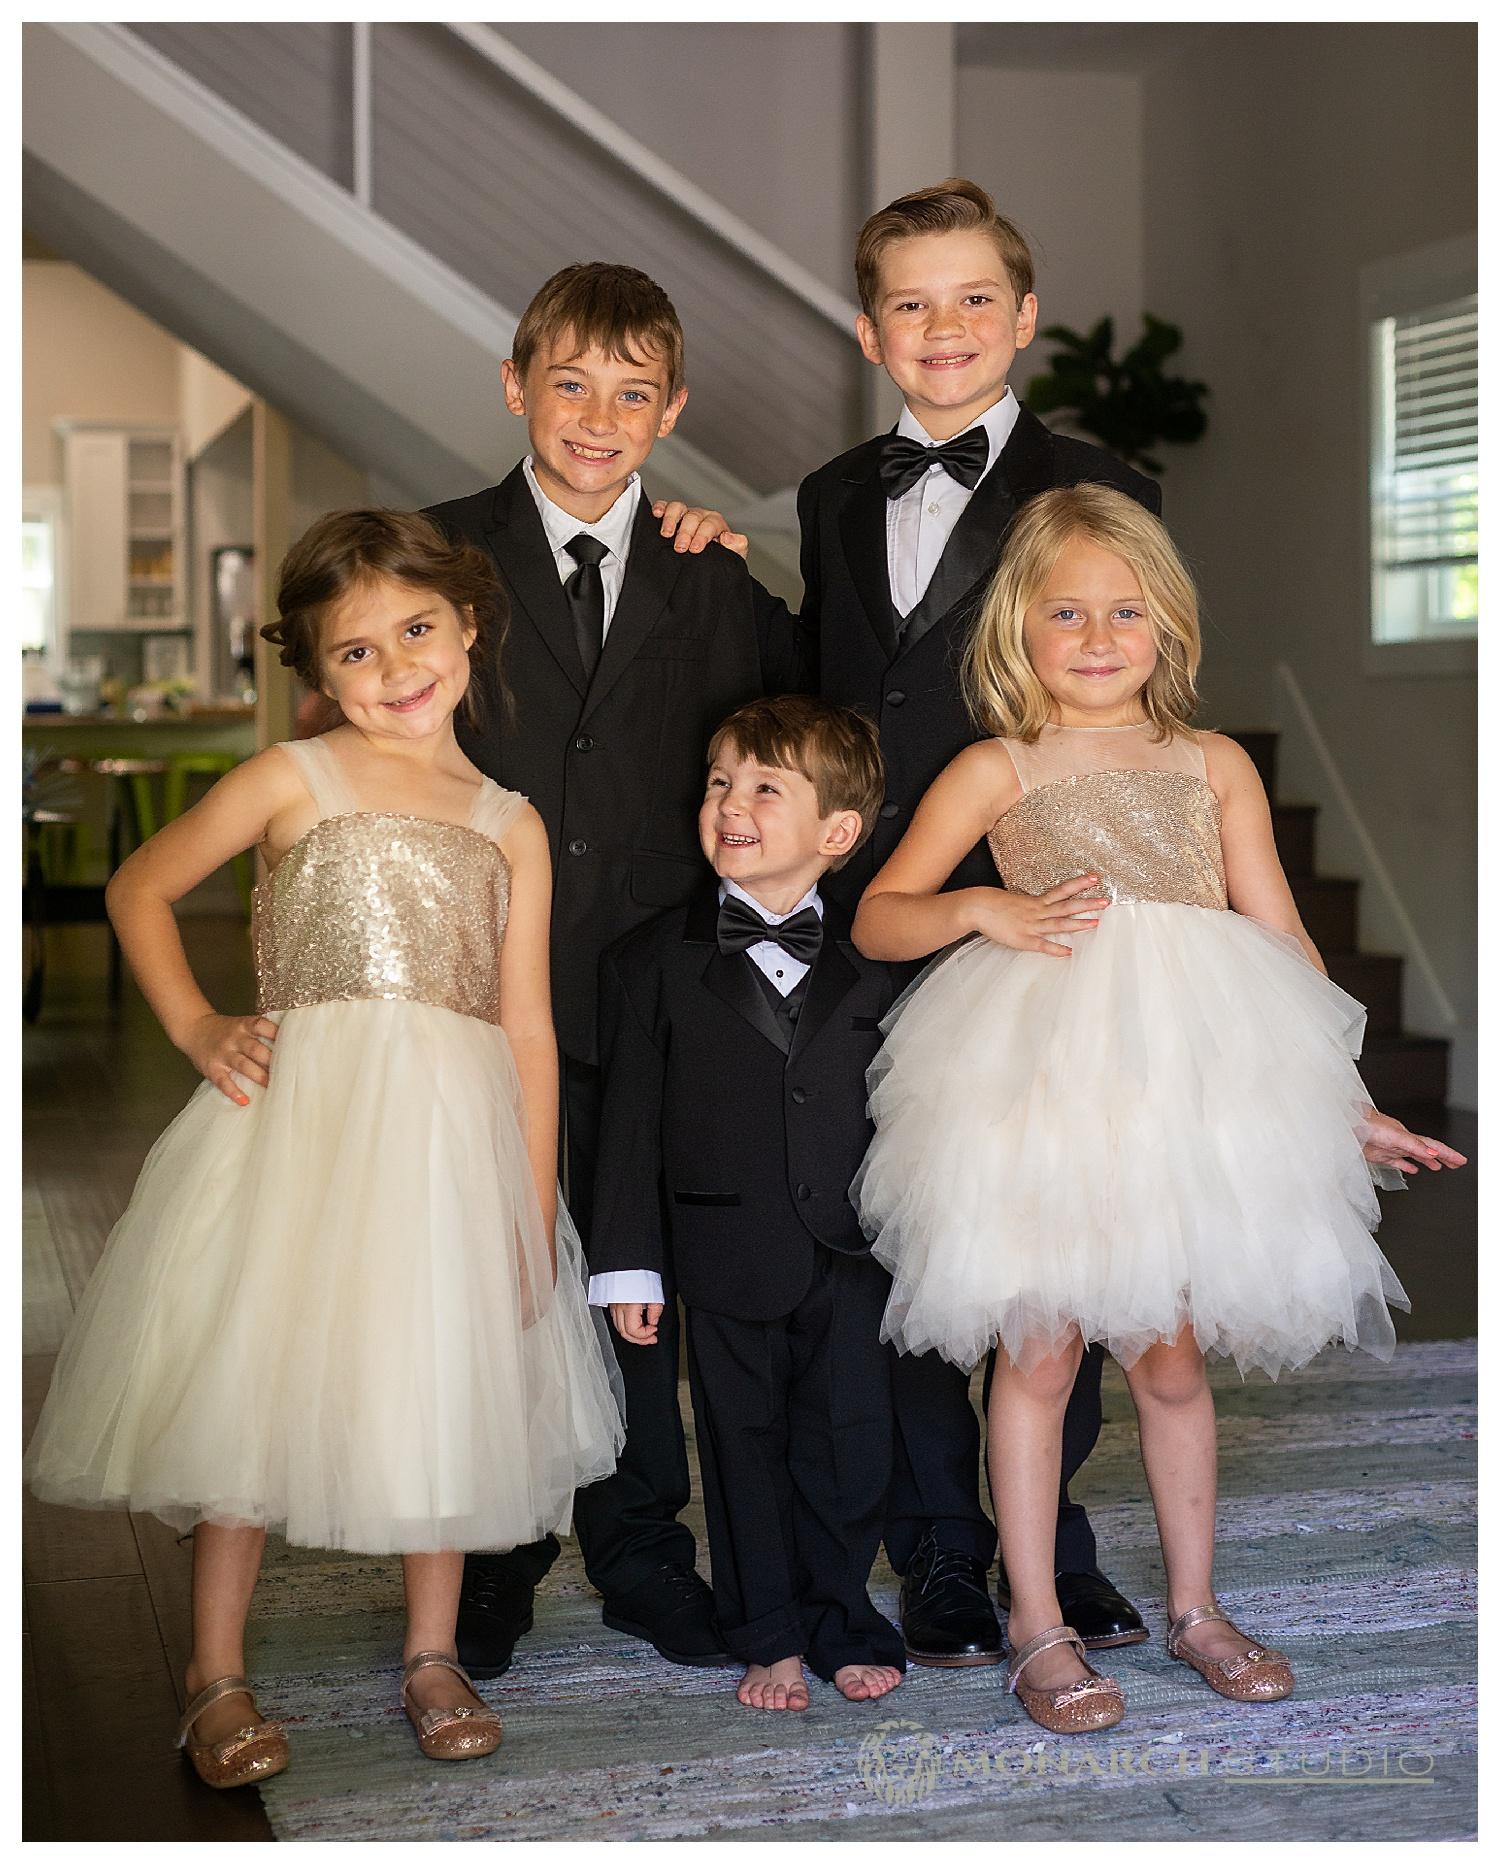 St. Augustine Wedding - Amore Wedding Chapel - 005.JPG